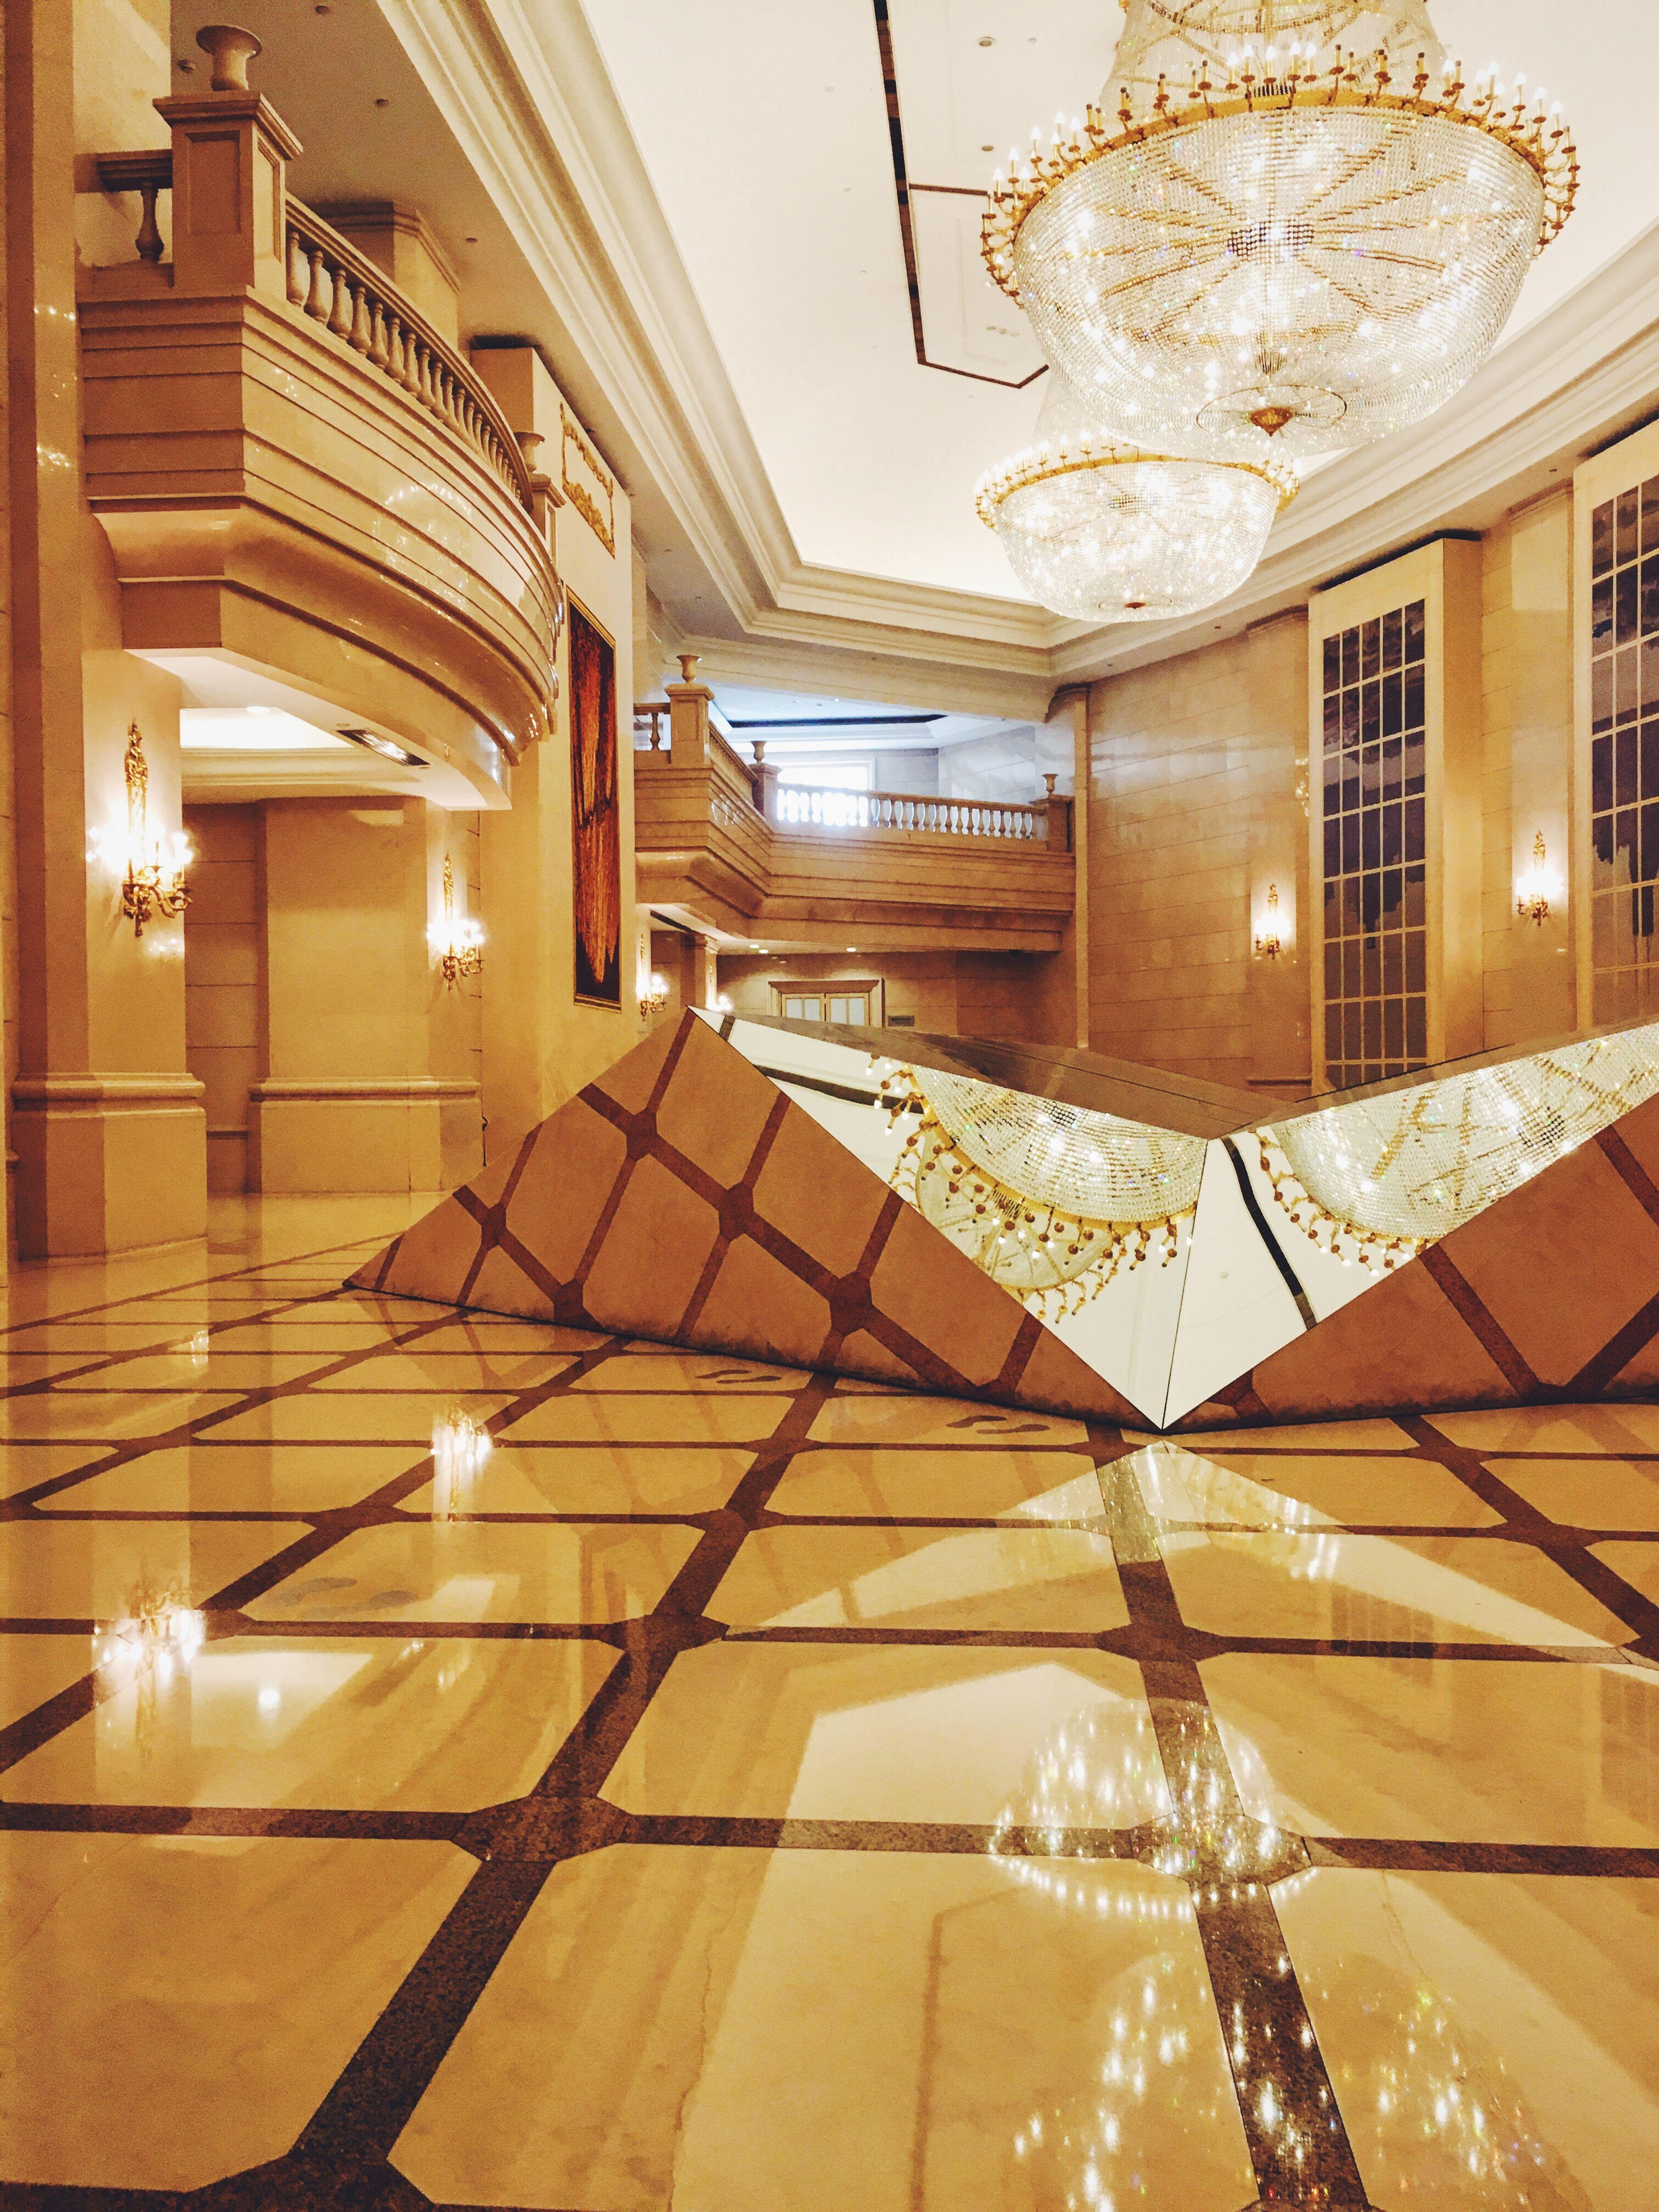 Exhibition @zhendan 43 Golden Moments Zhendan Exhibition Chandelier Glass Reflection Lights